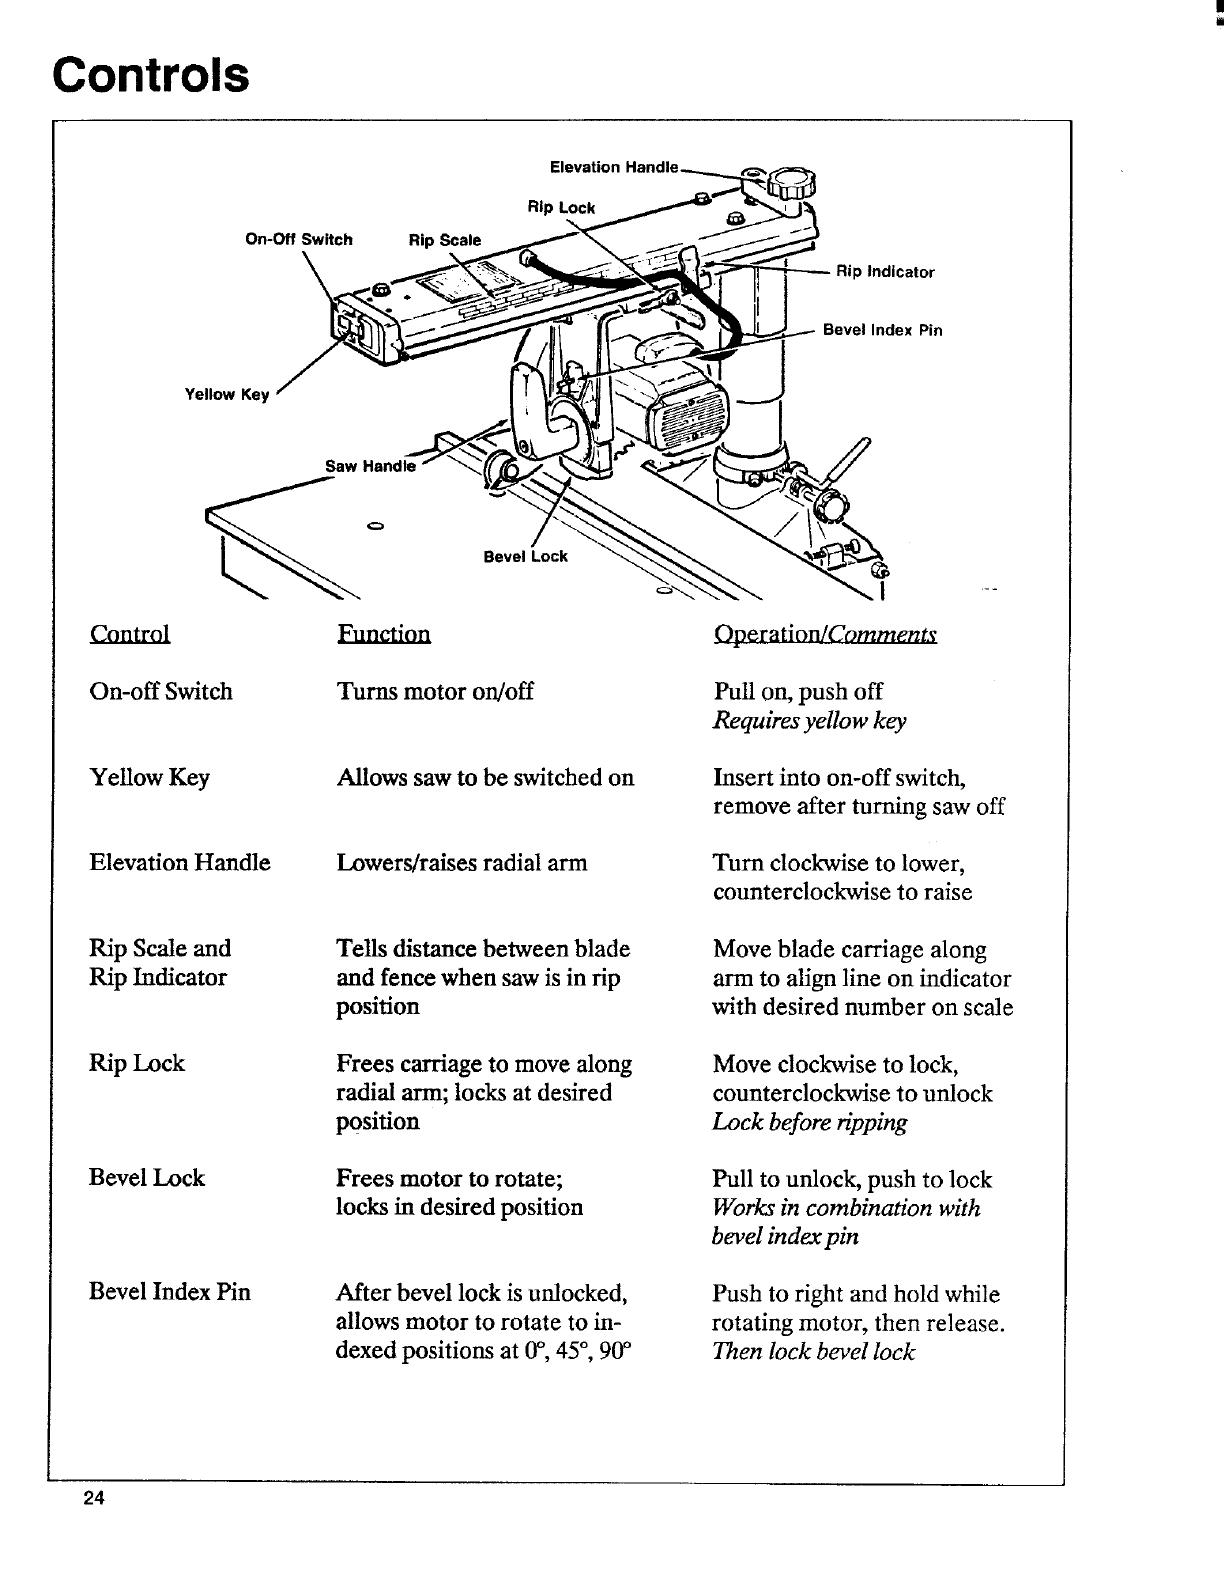 Foreskin Going To Rip Phismosis Manual Guide